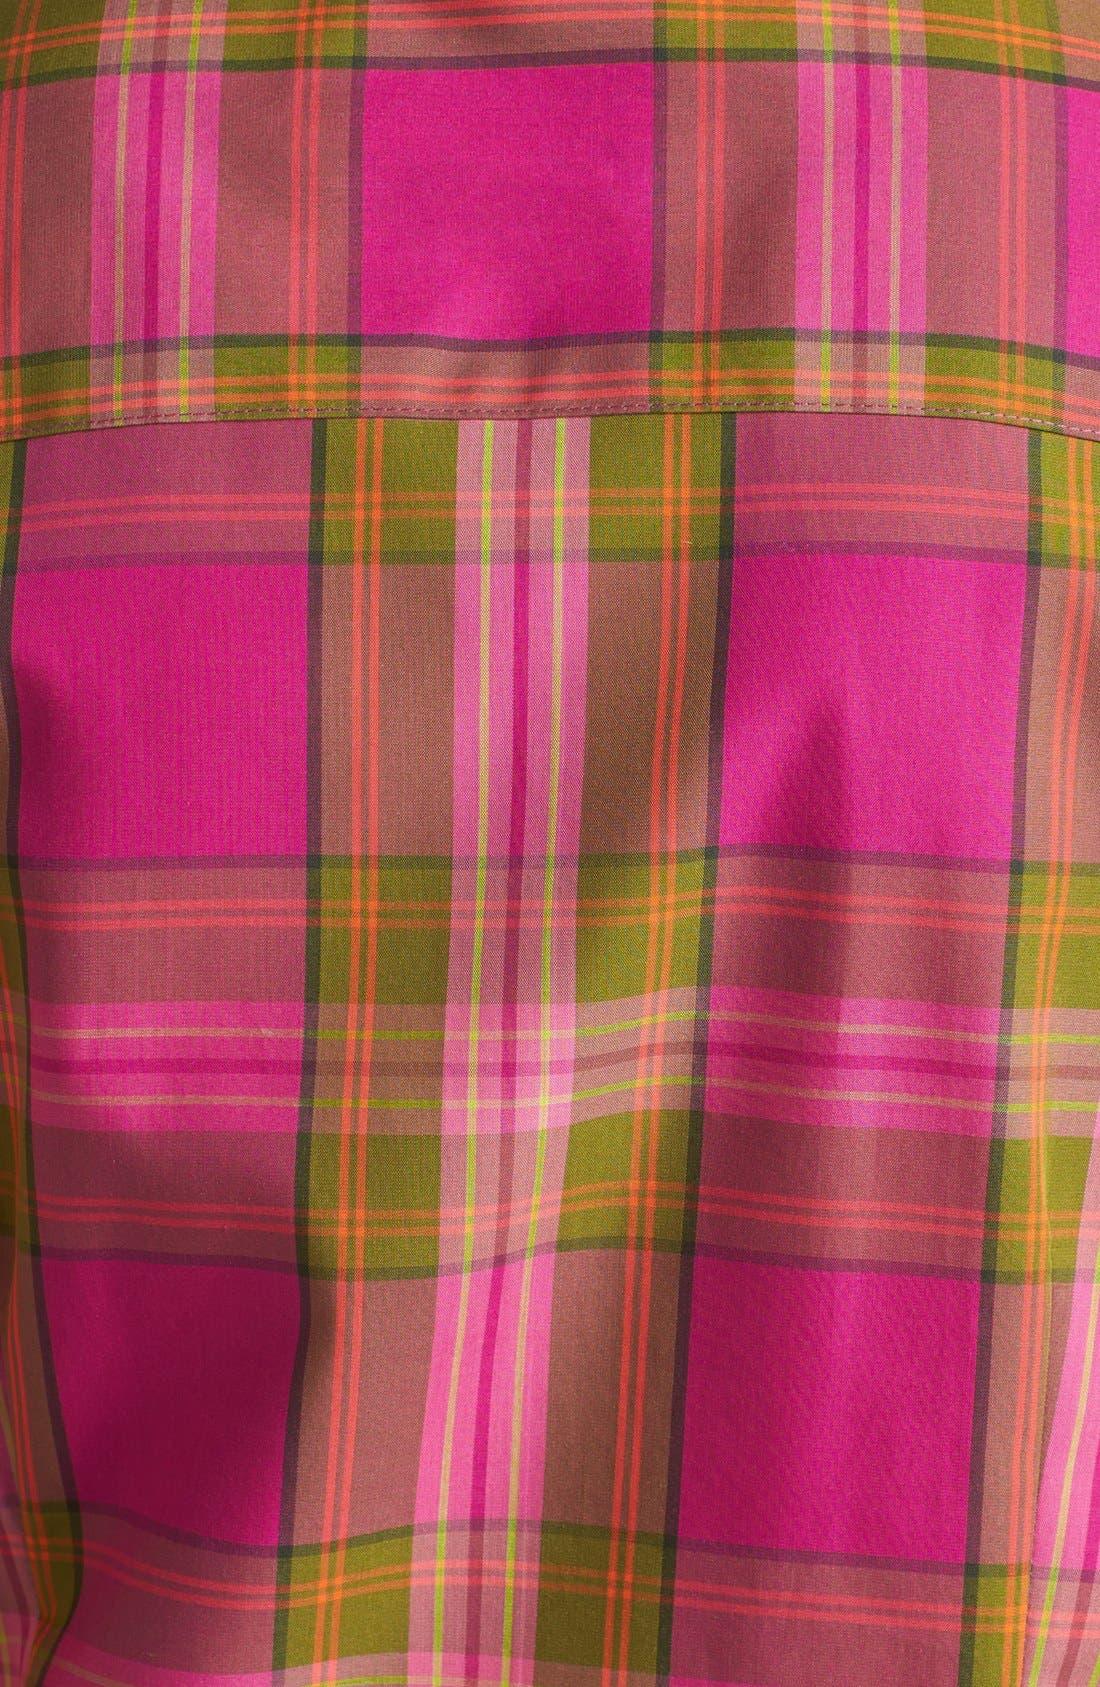 Alternate Image 3  - Foxcroft 'Autumn Tartan' Woven Cotton Shirt (Petite)